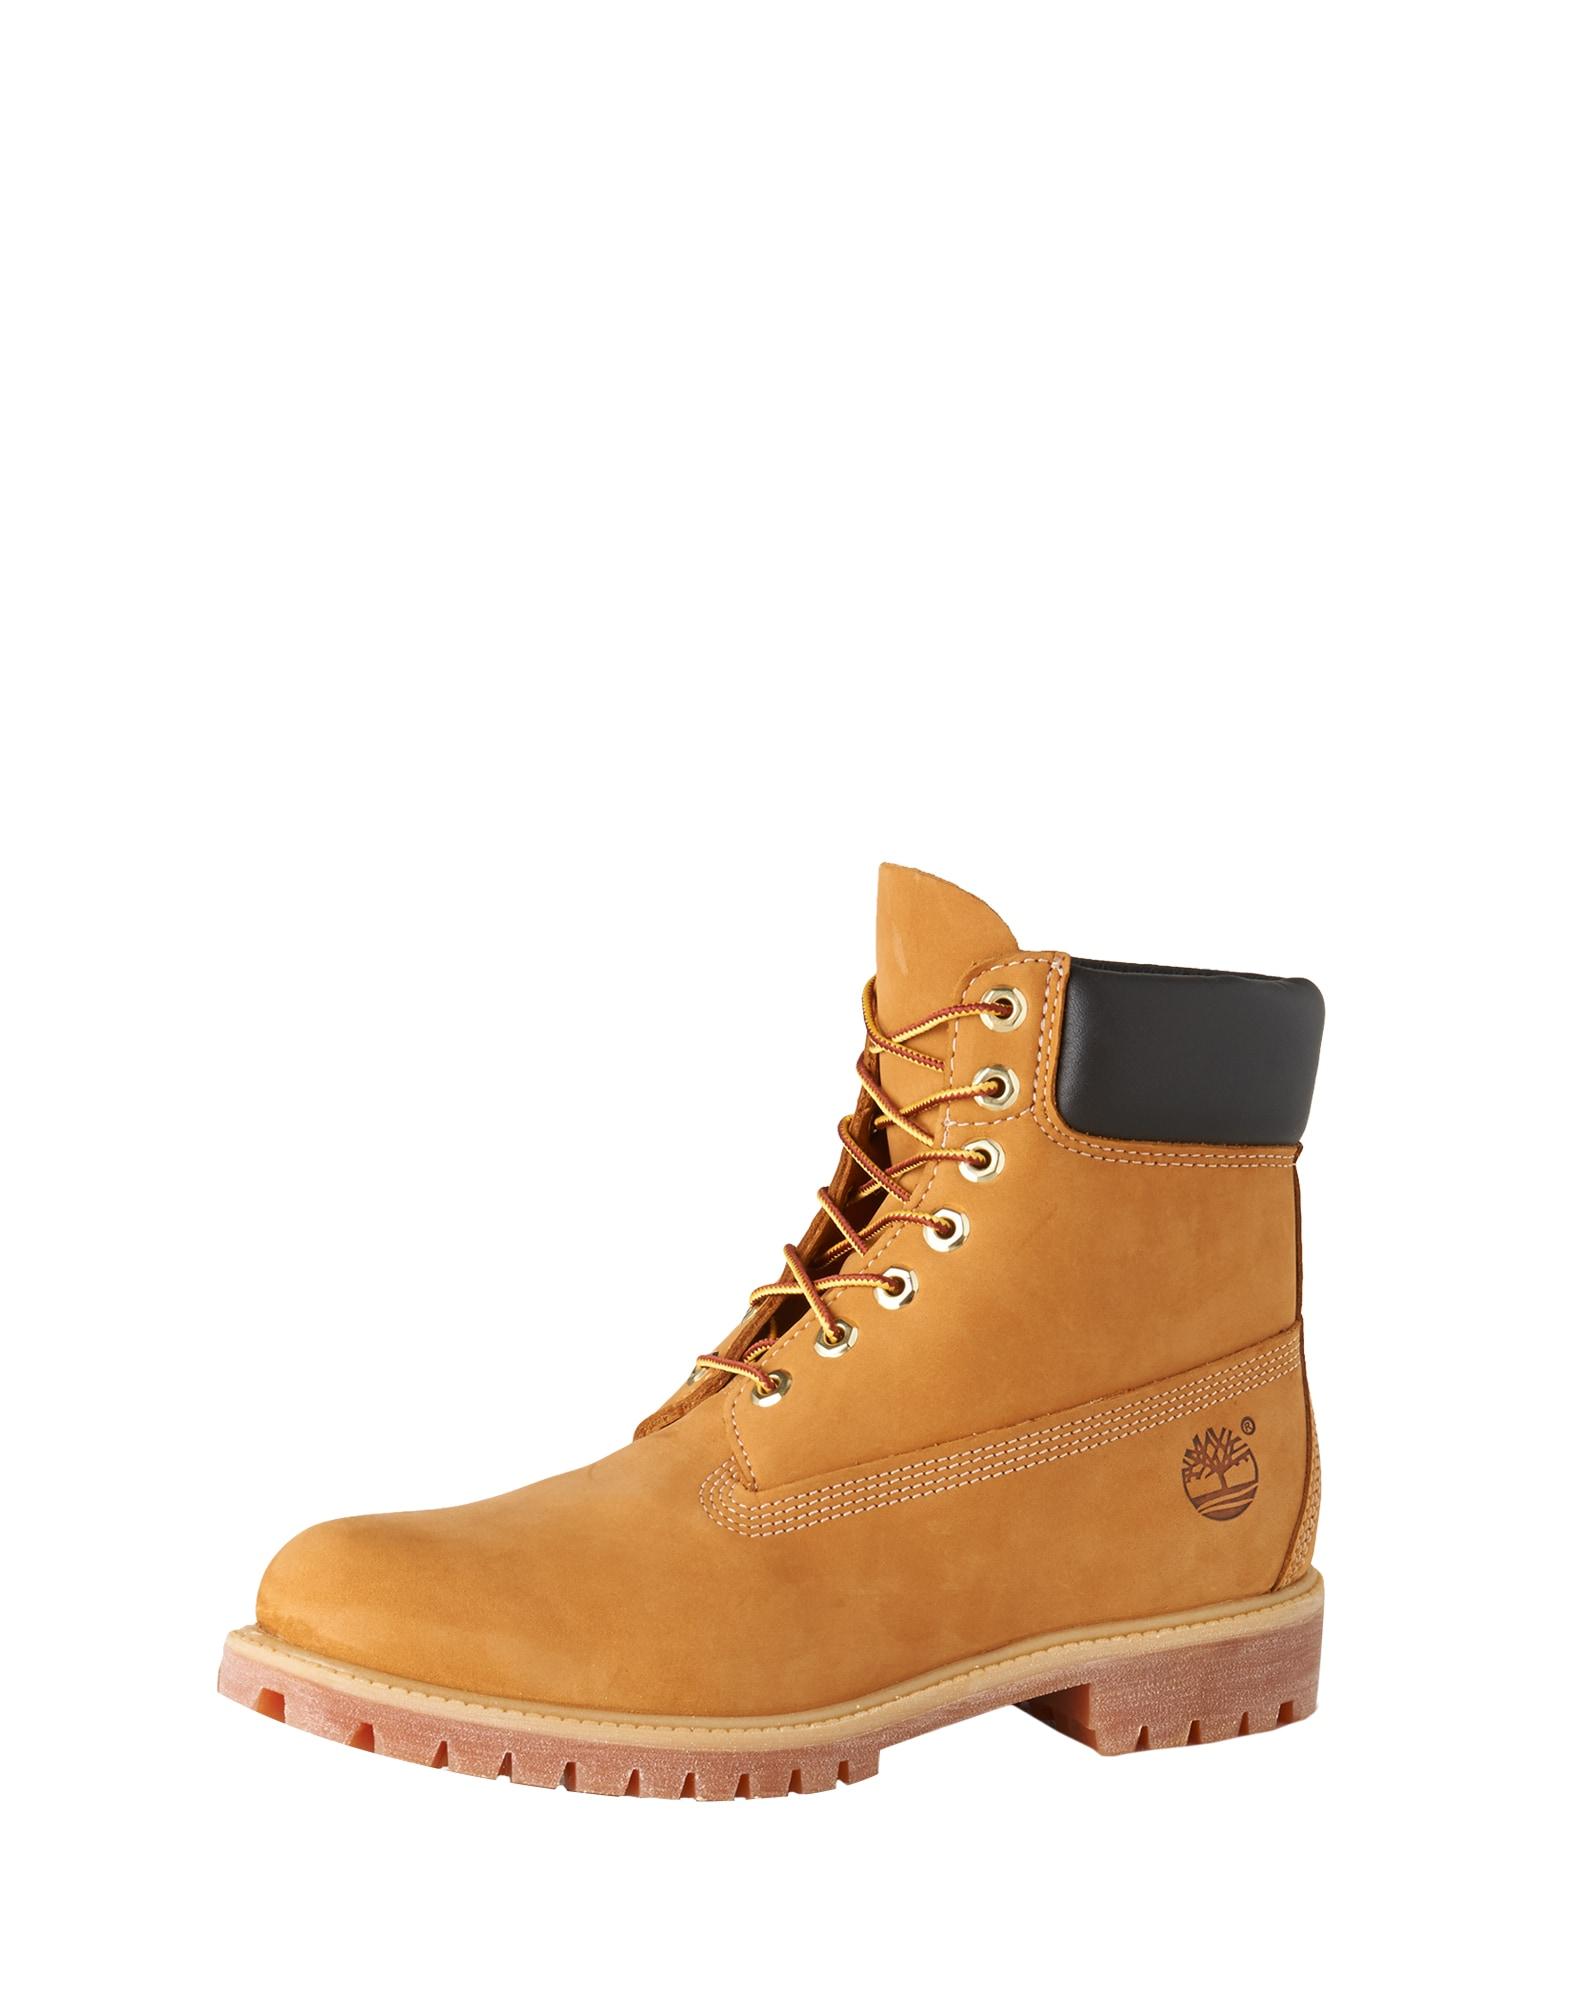 Šněrovací boty AF 6IN Premium Boot kari TIMBERLAND